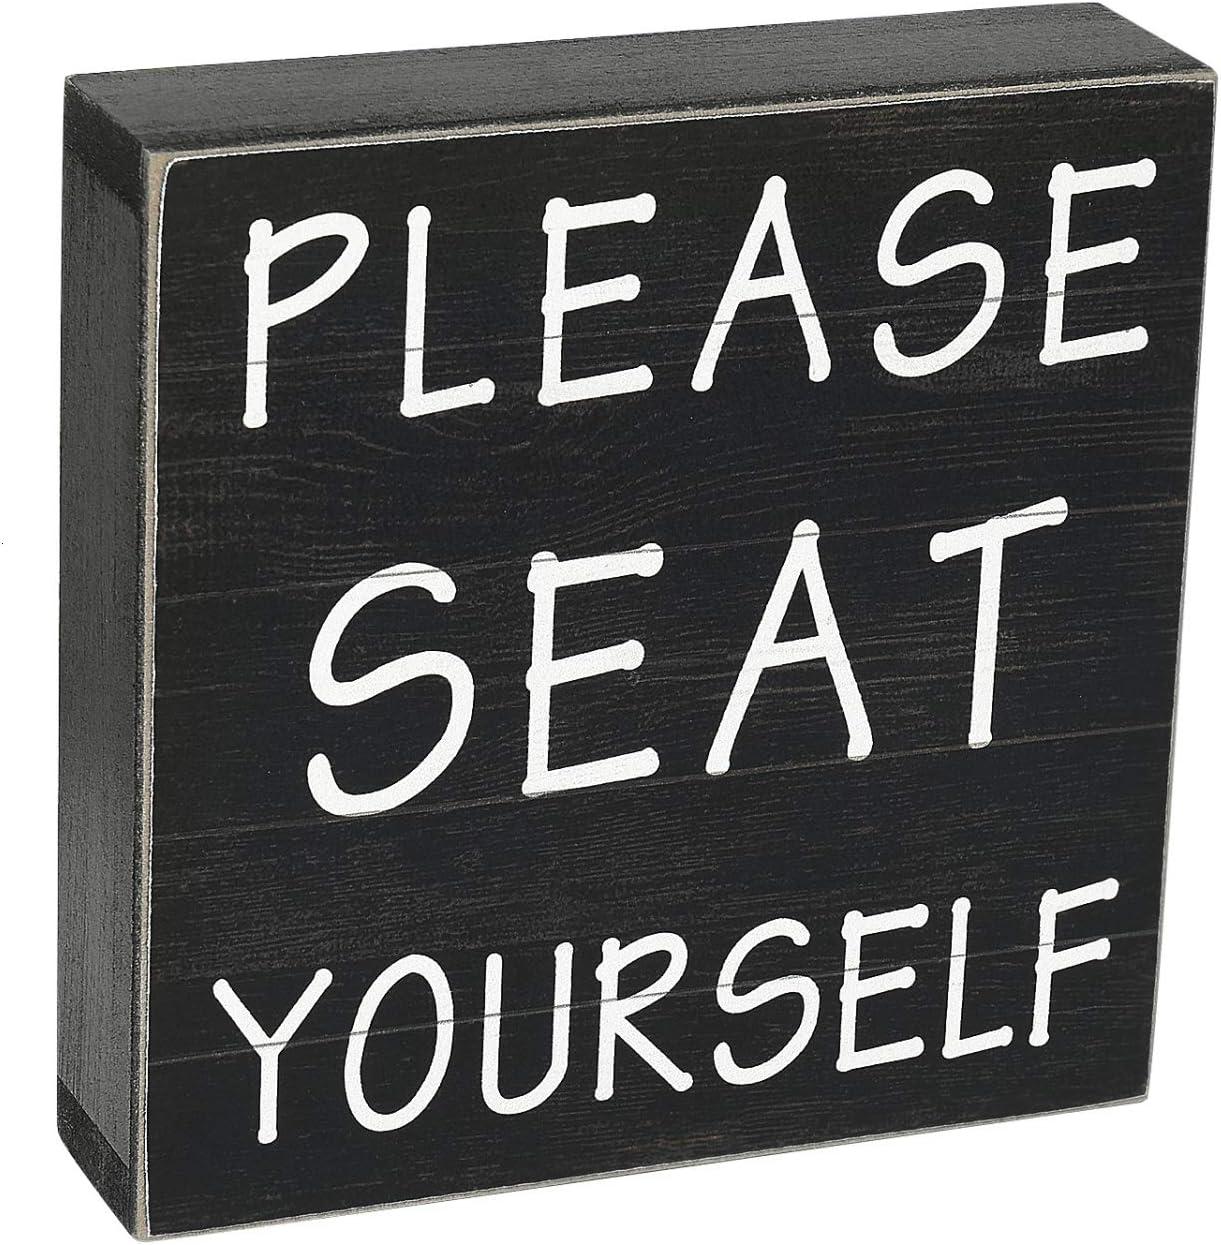 Vumdua Funny Bathroom Signs, Farmhouse Bathroom Wall Decor, 6 x 6 Inches, Please Seat Yourself Bathroom Sign